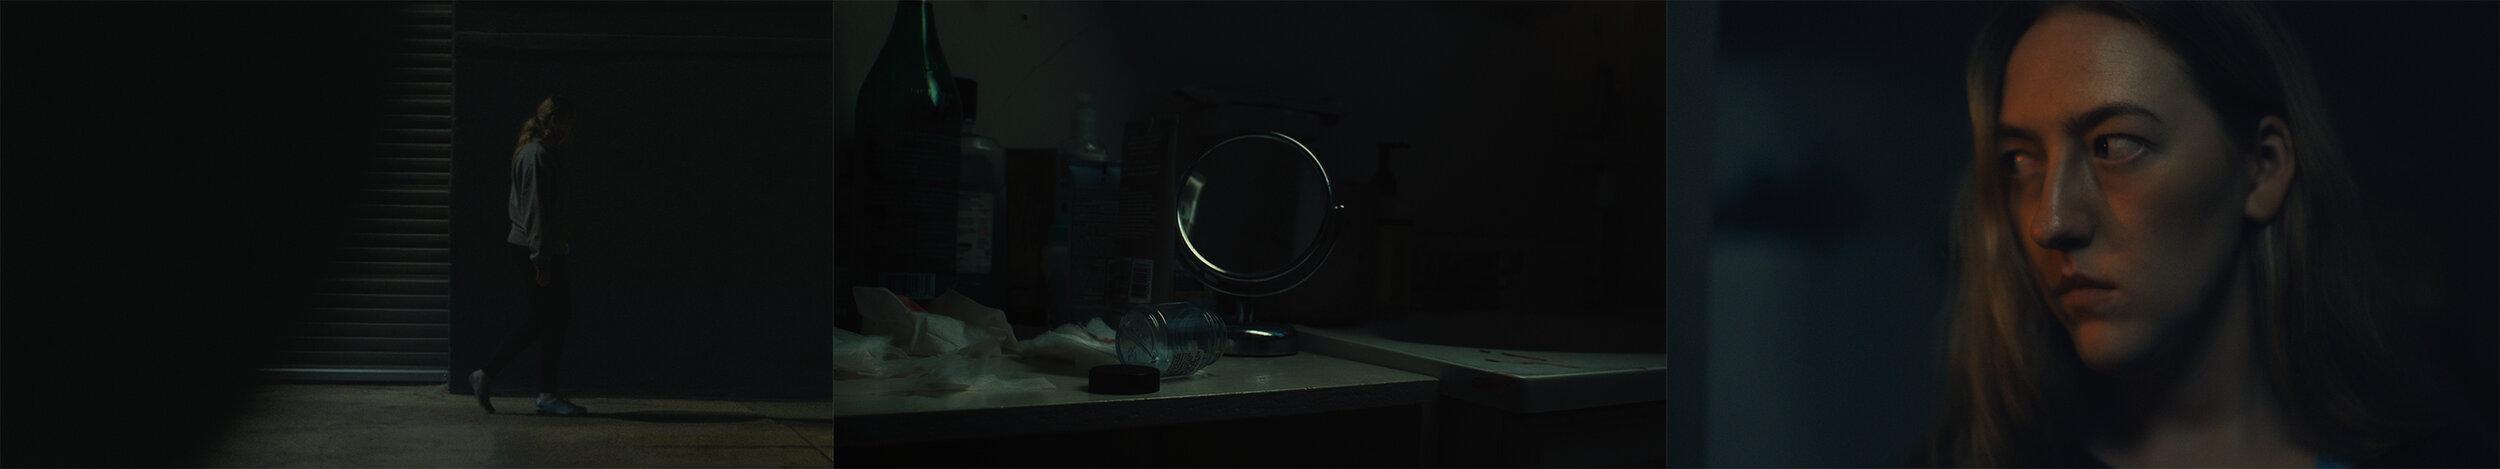 PEOPLE WILL NOT BELIEVE (2018) / dir. Myles Hawthorne